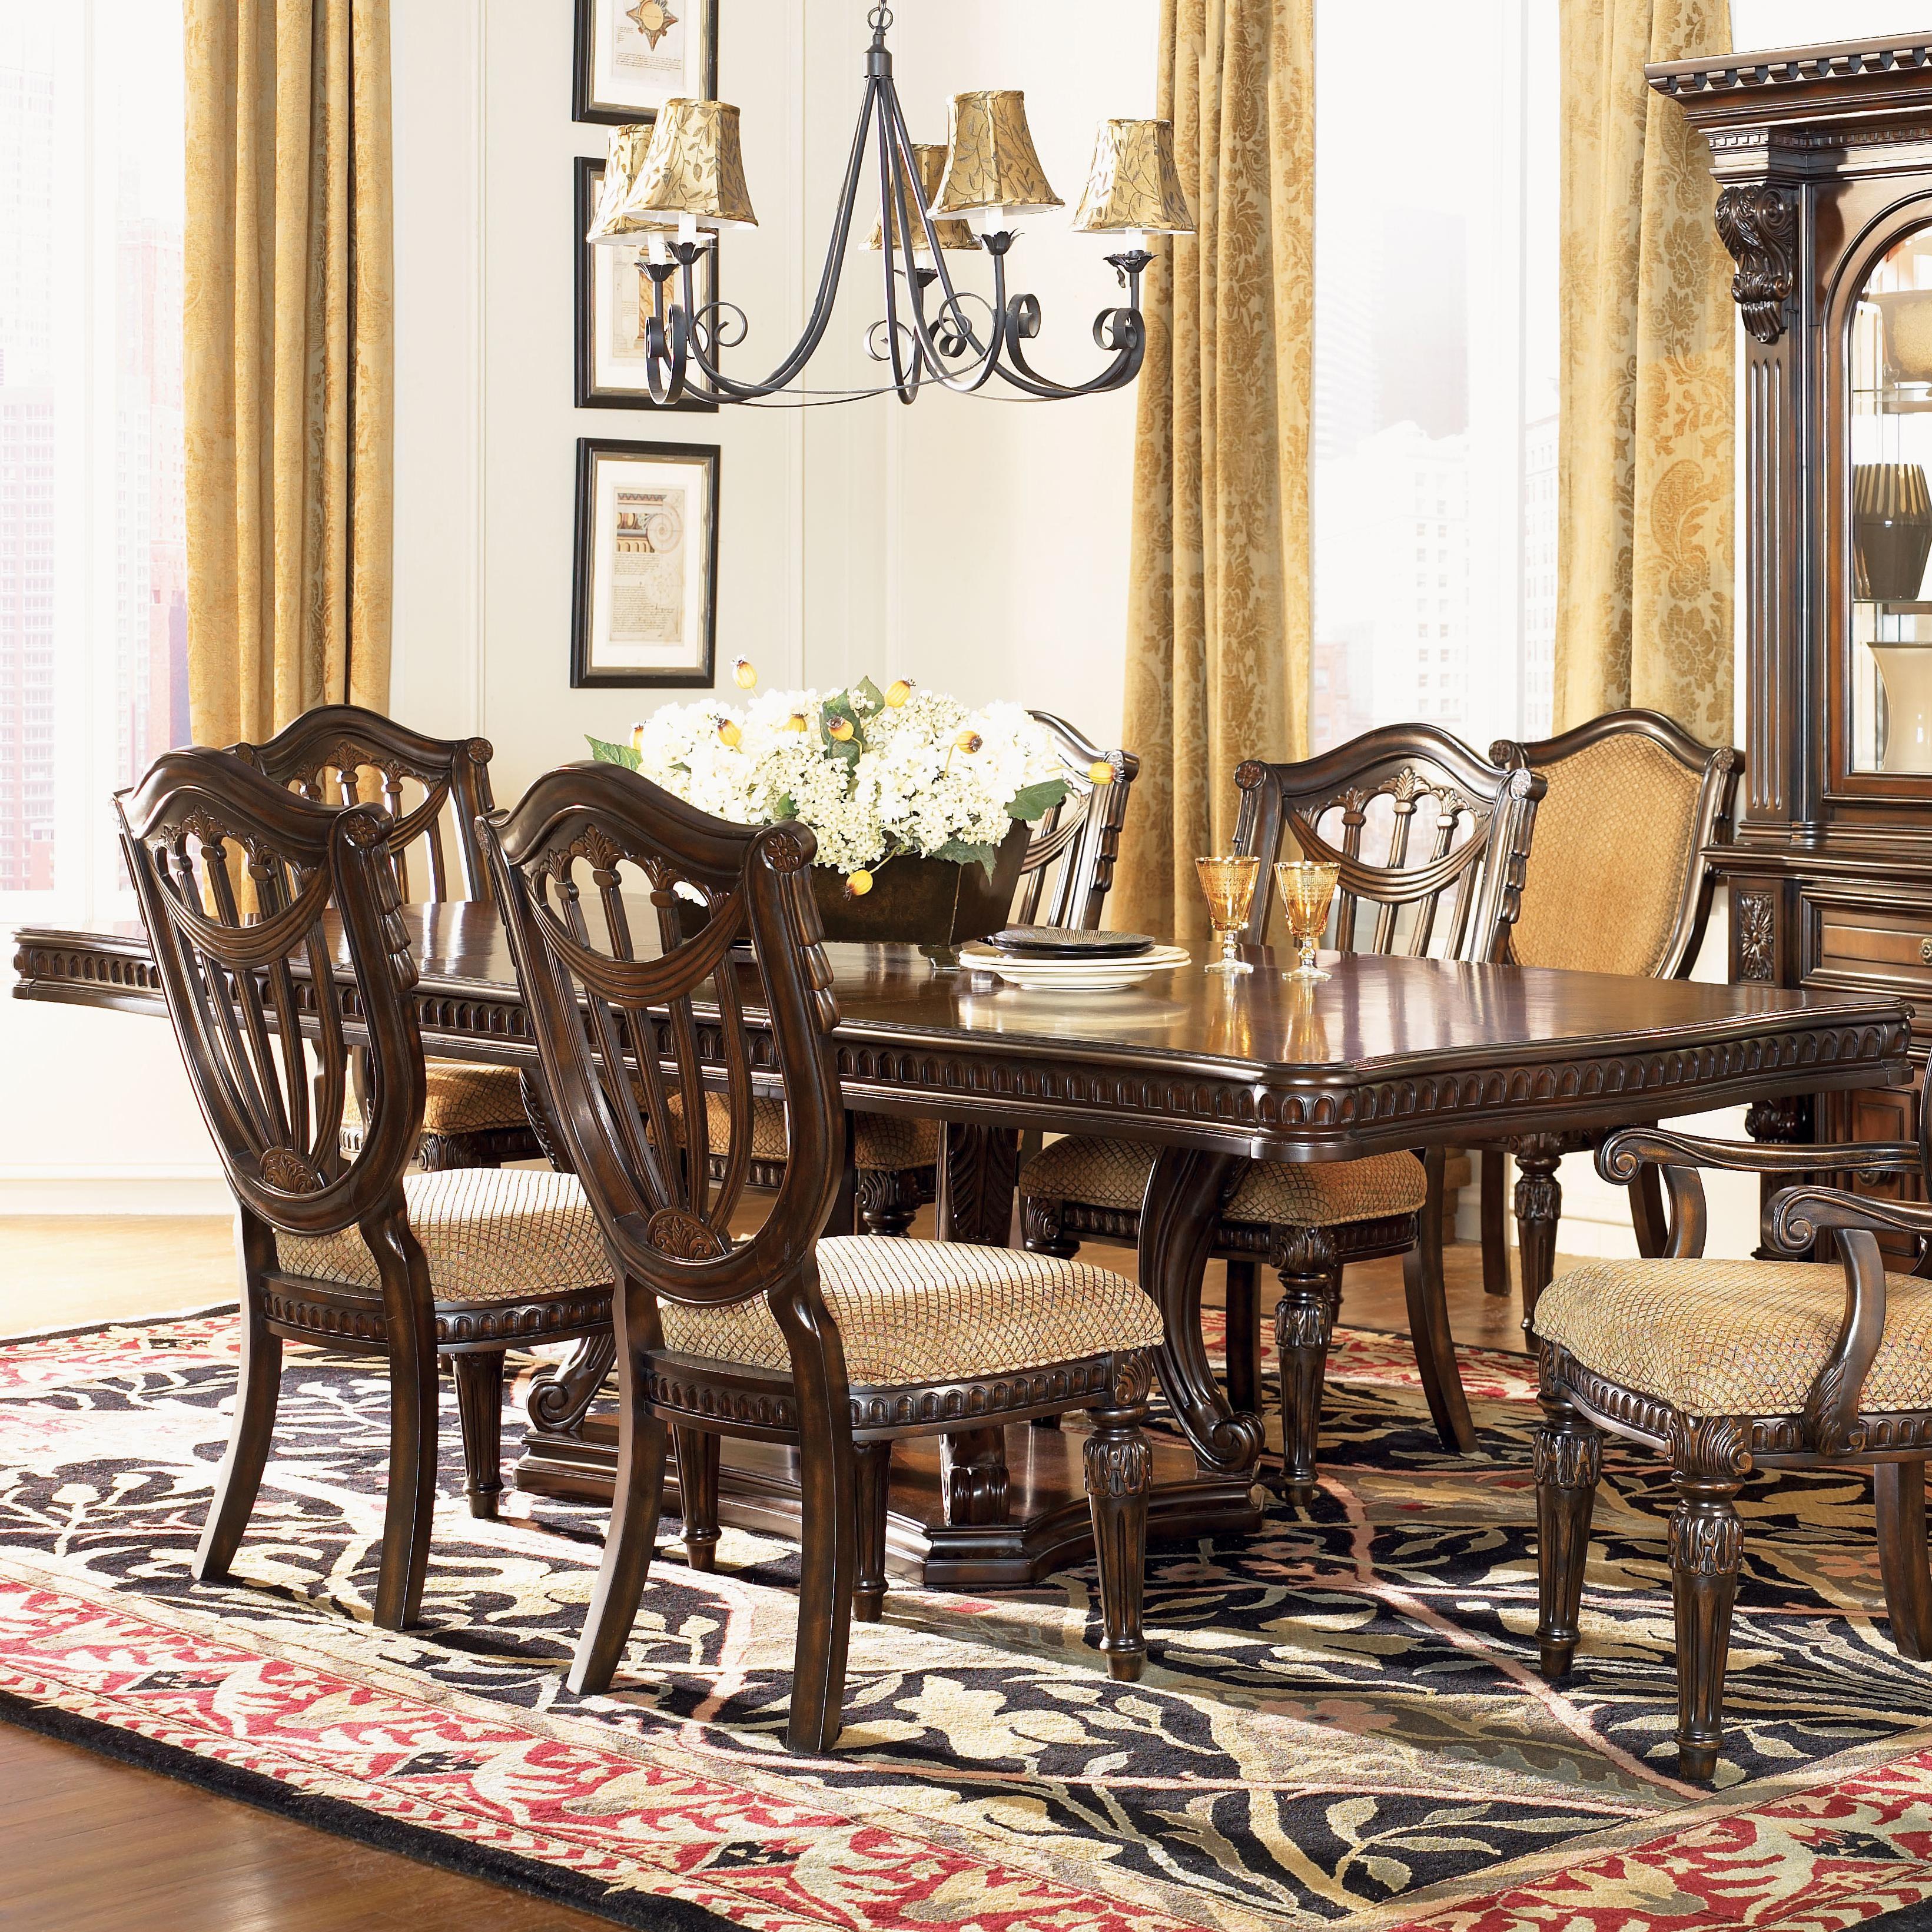 Fairmont Designs Grand Estates Double Pedestal Rectangular Dining Table Royal Furniture Dining Tables